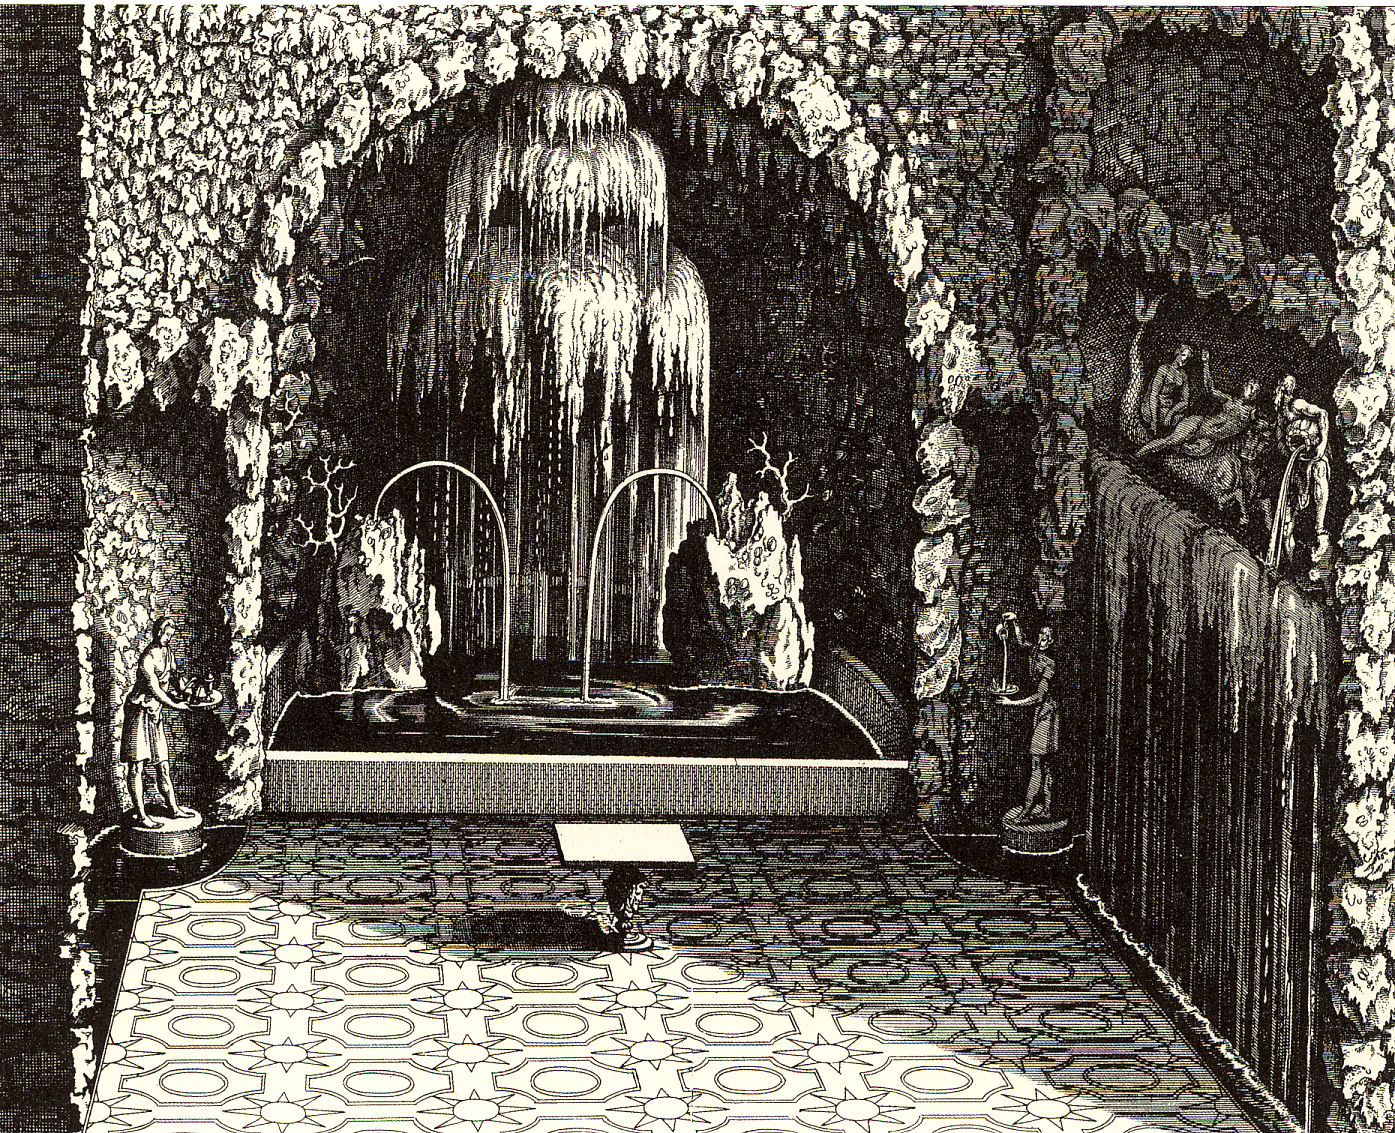 http://upload.wikimedia.org/wikipedia/commons/8/83/Grotte_im_Hortus_Palatinus_von_Salomon_de_Caus.jpg